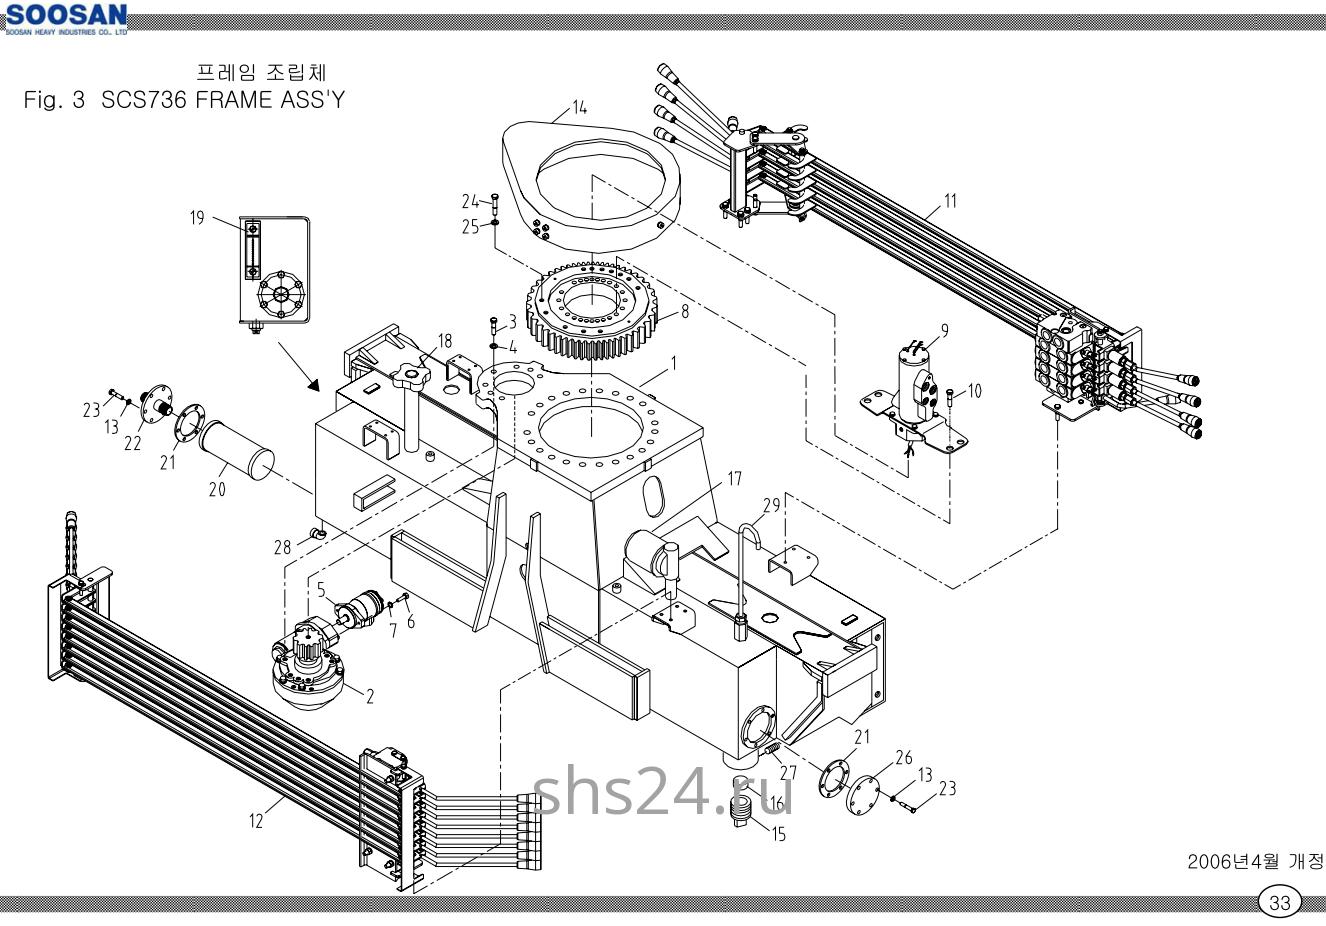 Опорно-поворотный подшипник (ОПУ) Soosan SCS 736